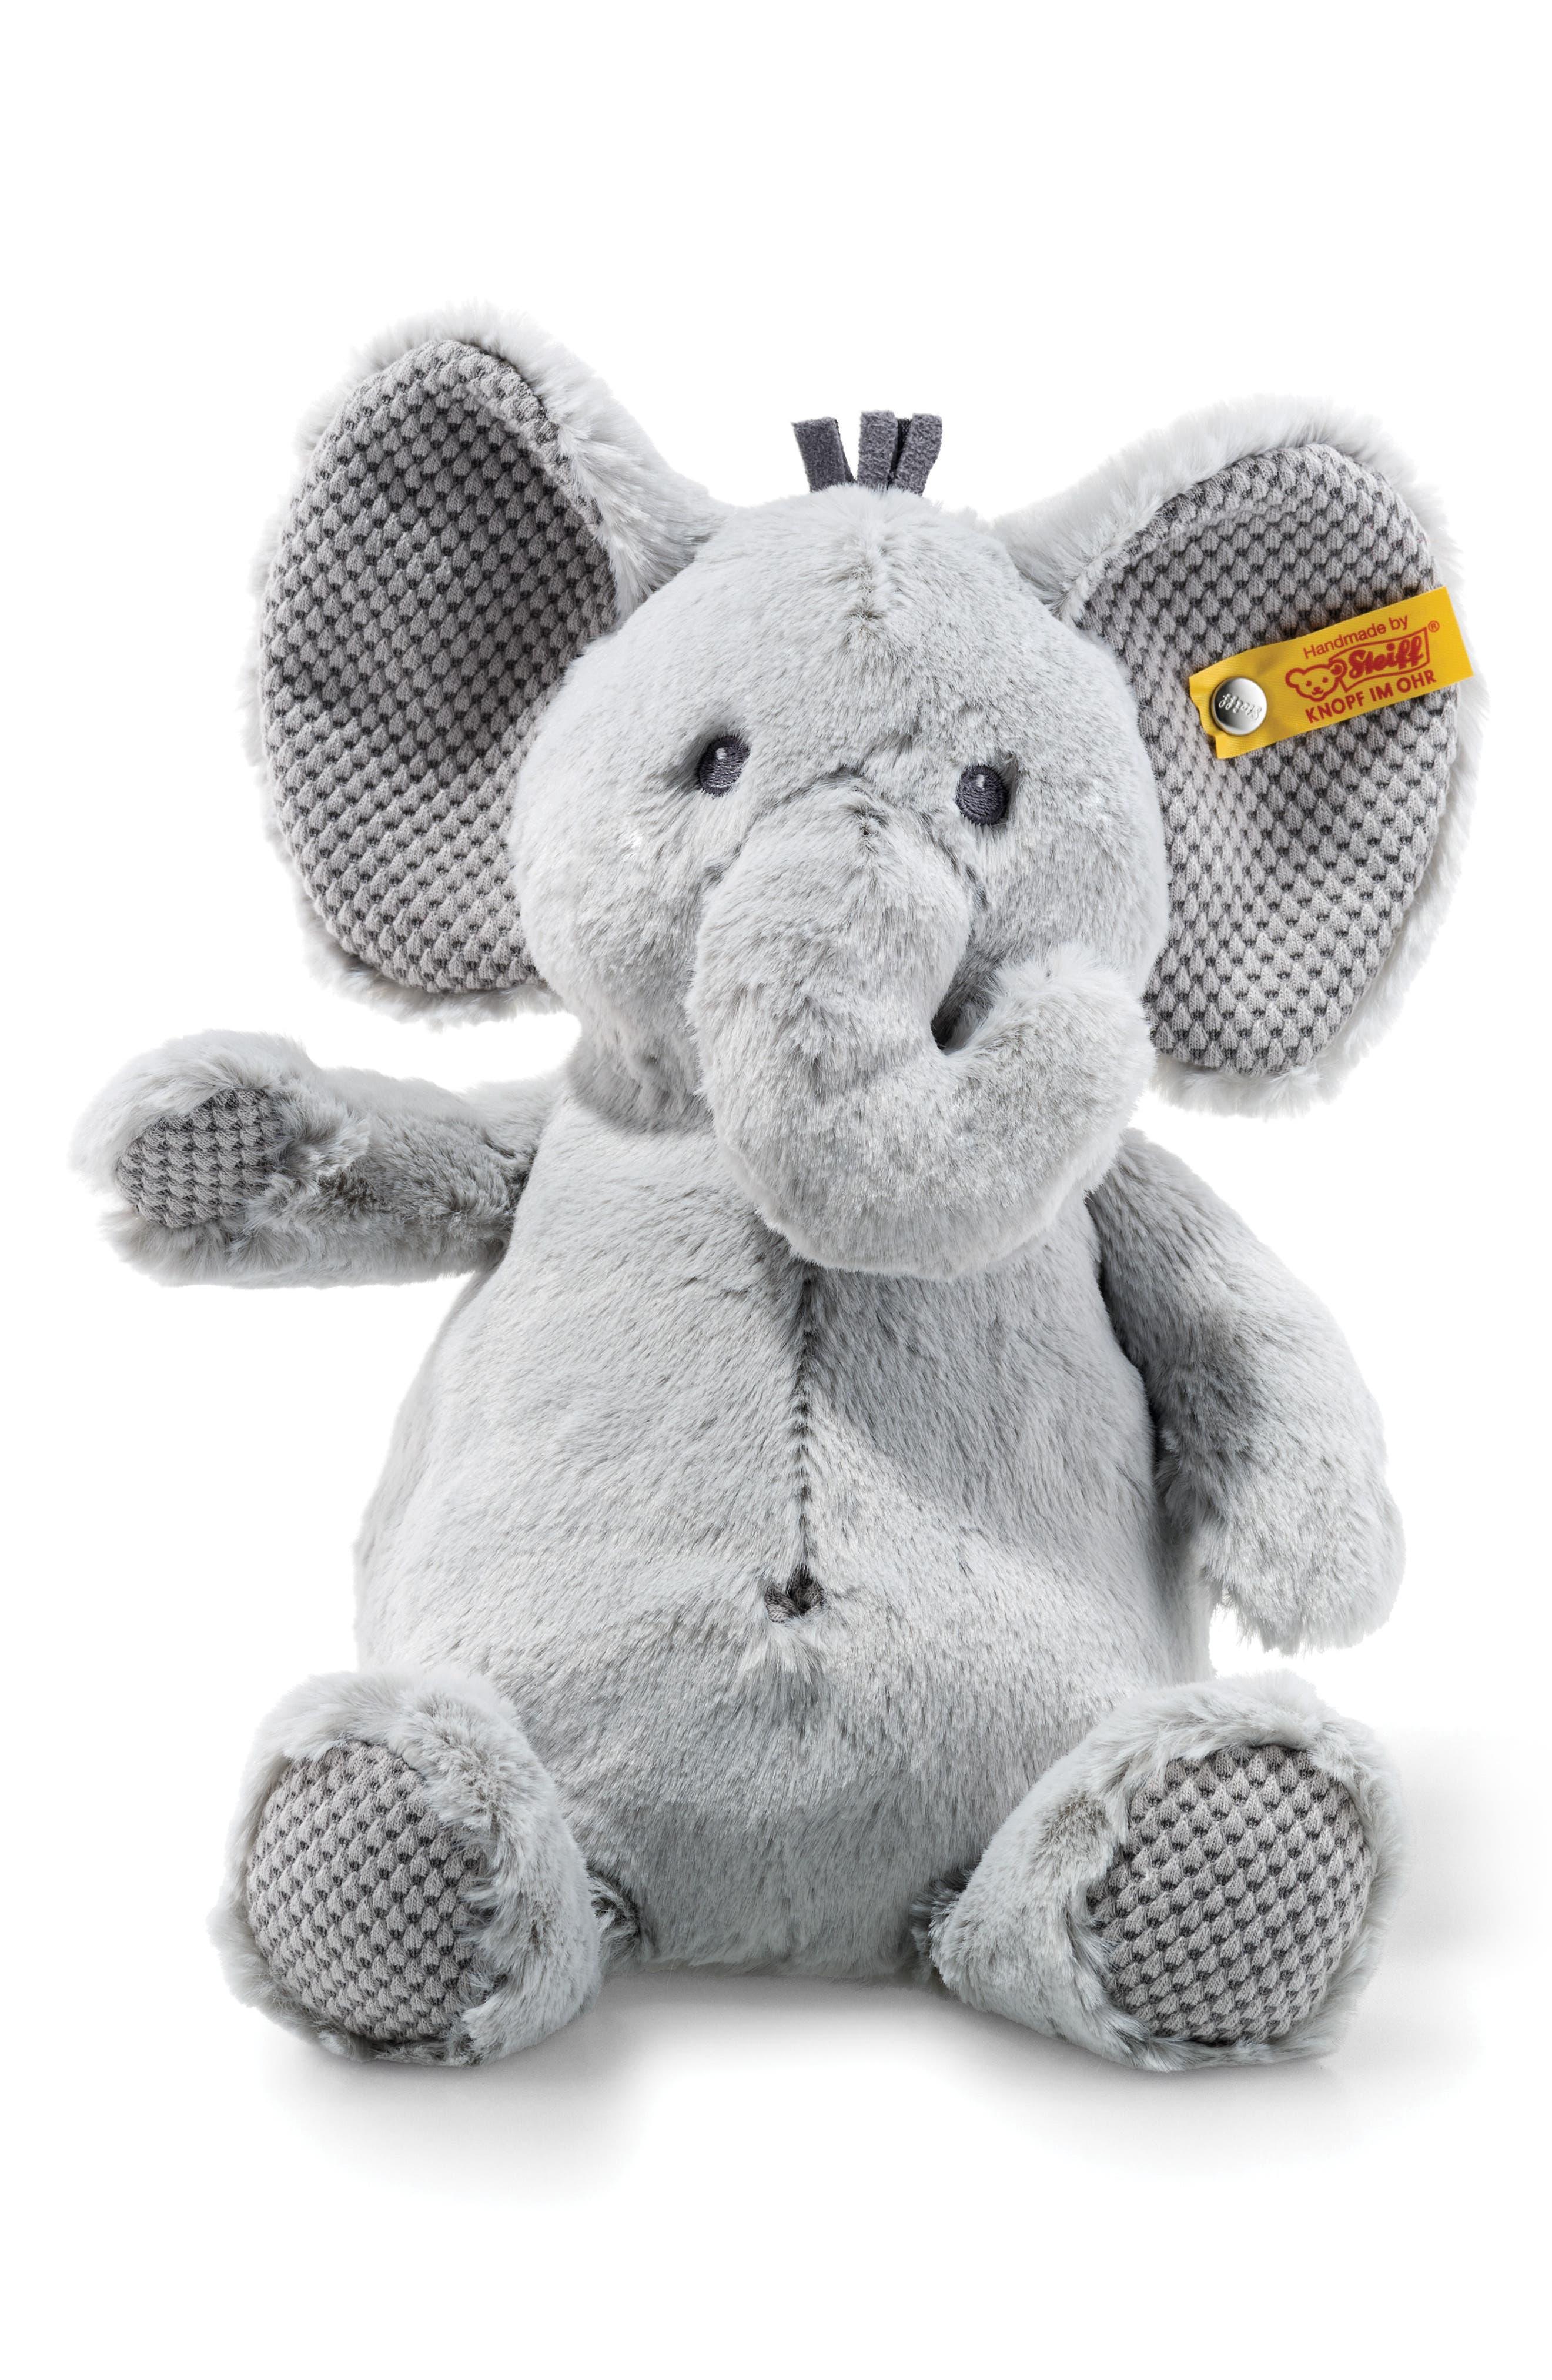 Ellie Elephant Stuffed Animal,                             Main thumbnail 1, color,                             020